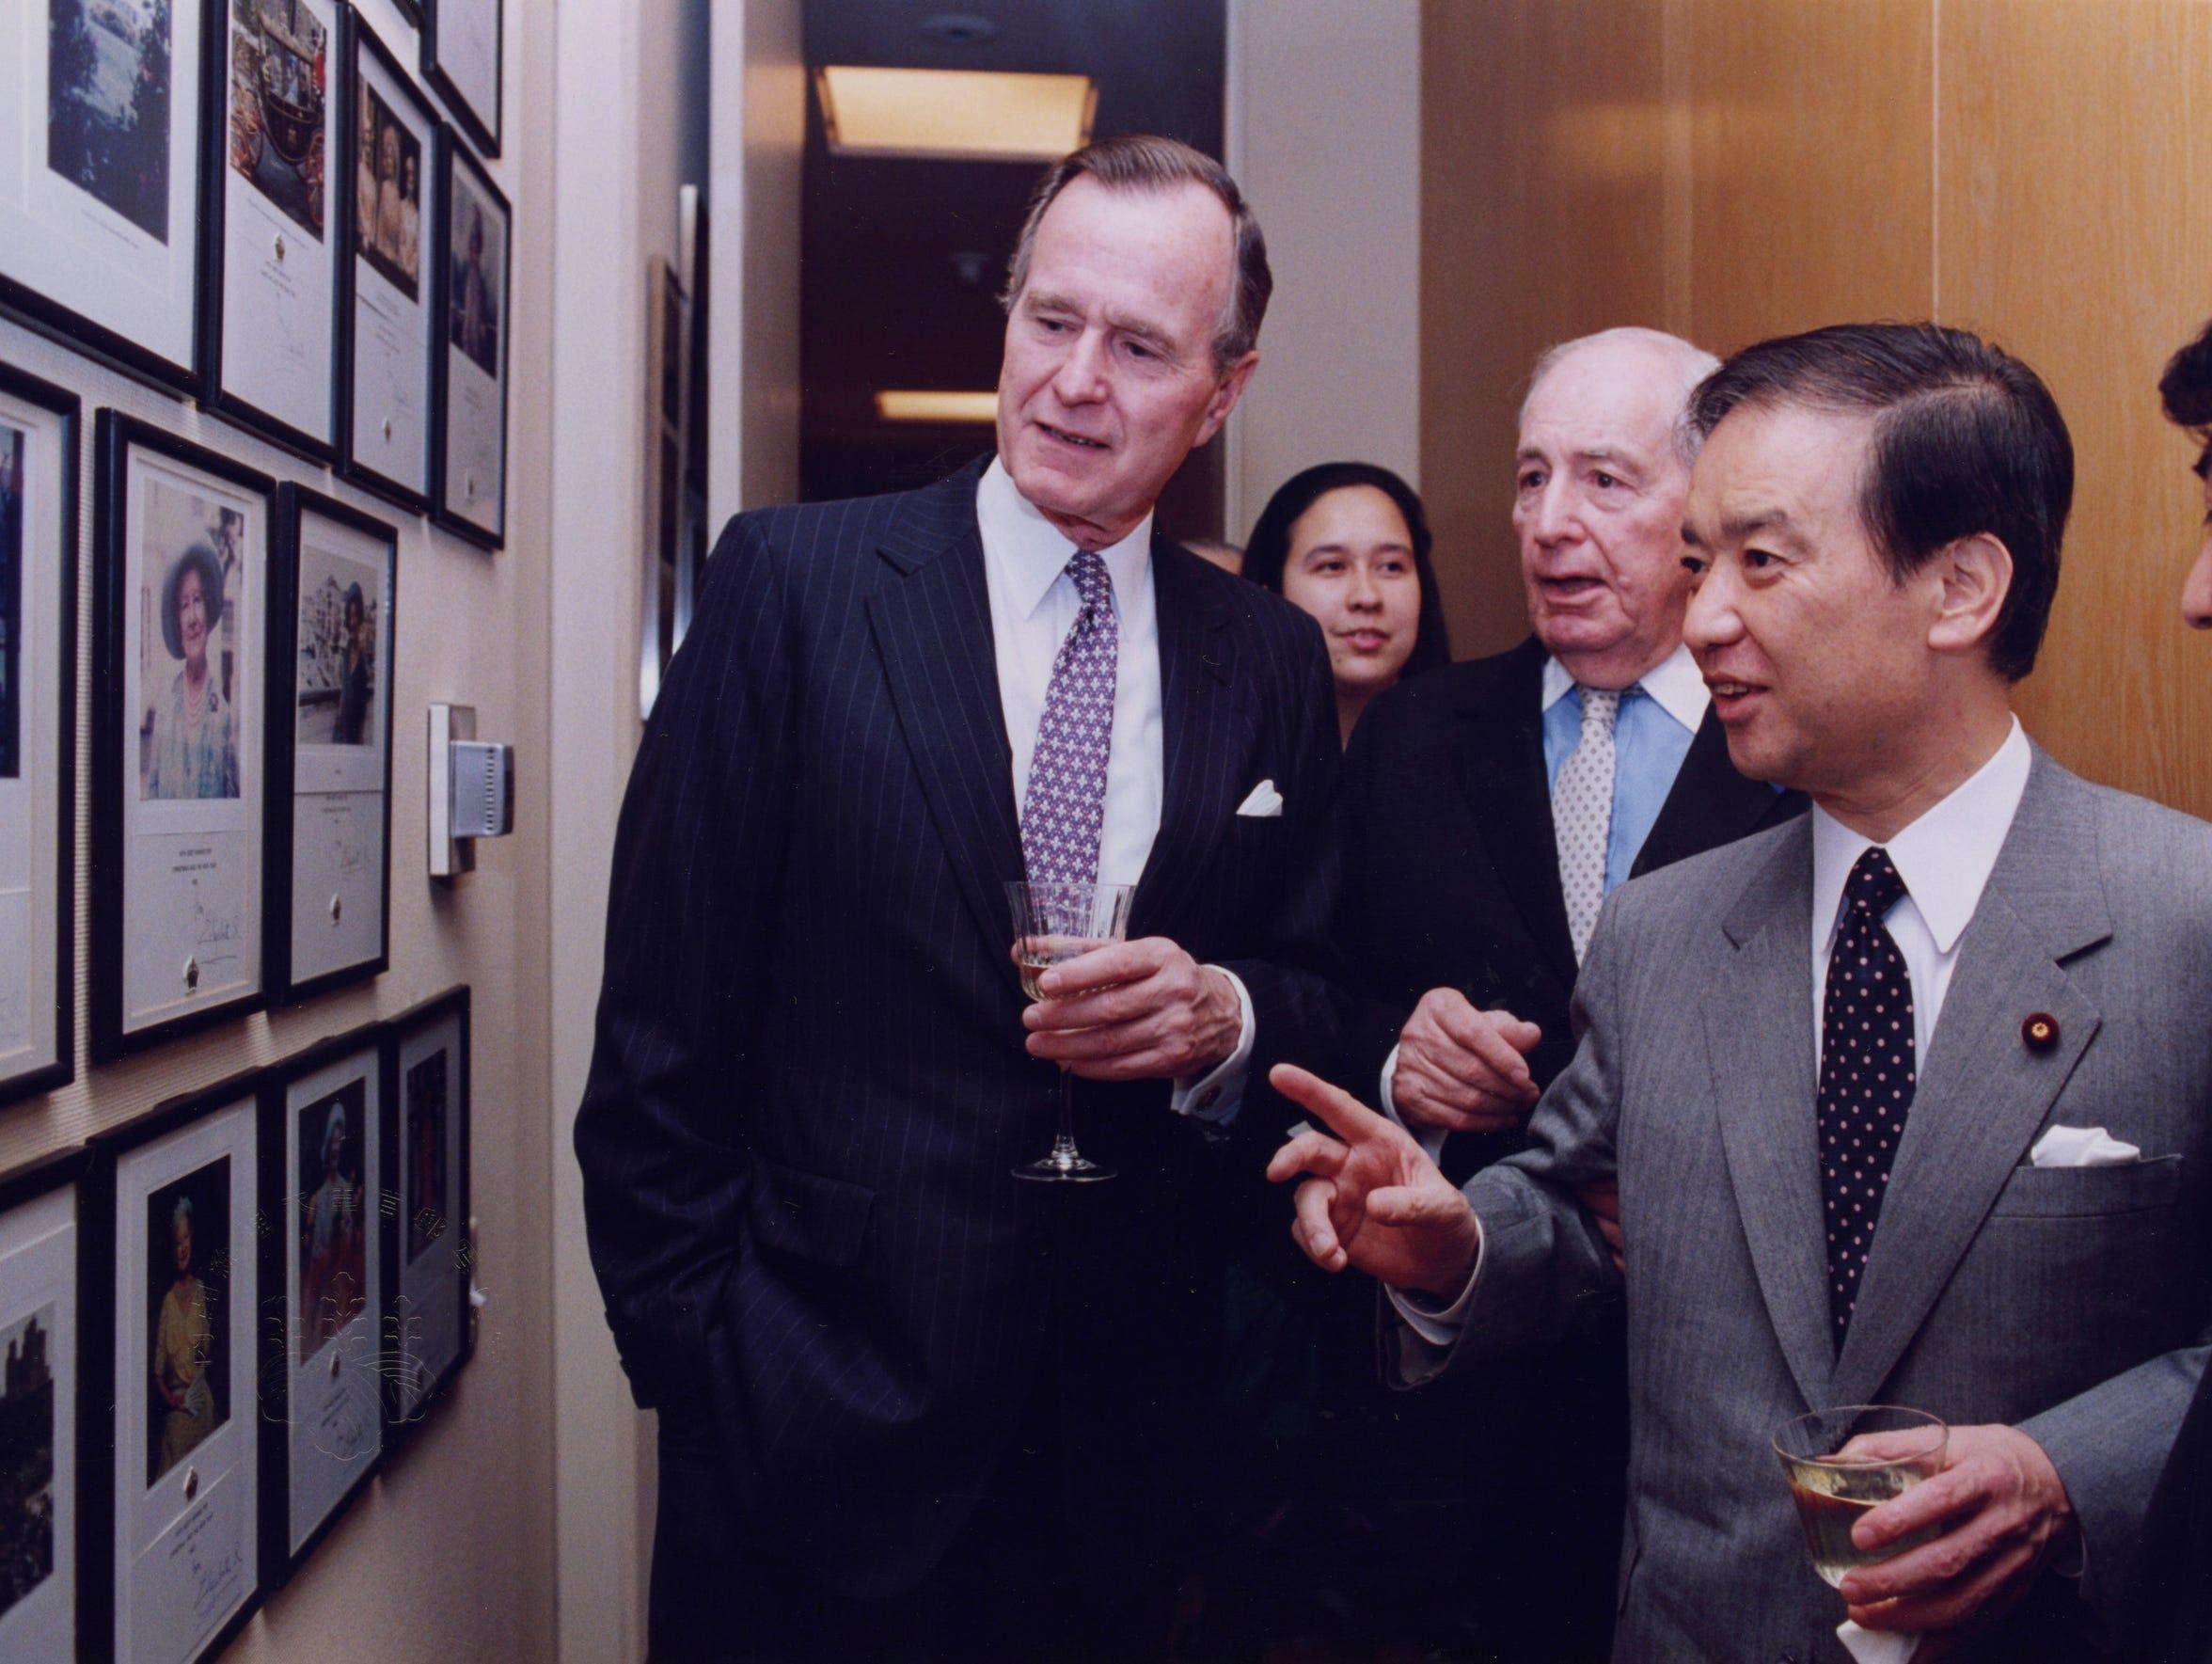 President Bush, Walter Annenber, and Prime Minister